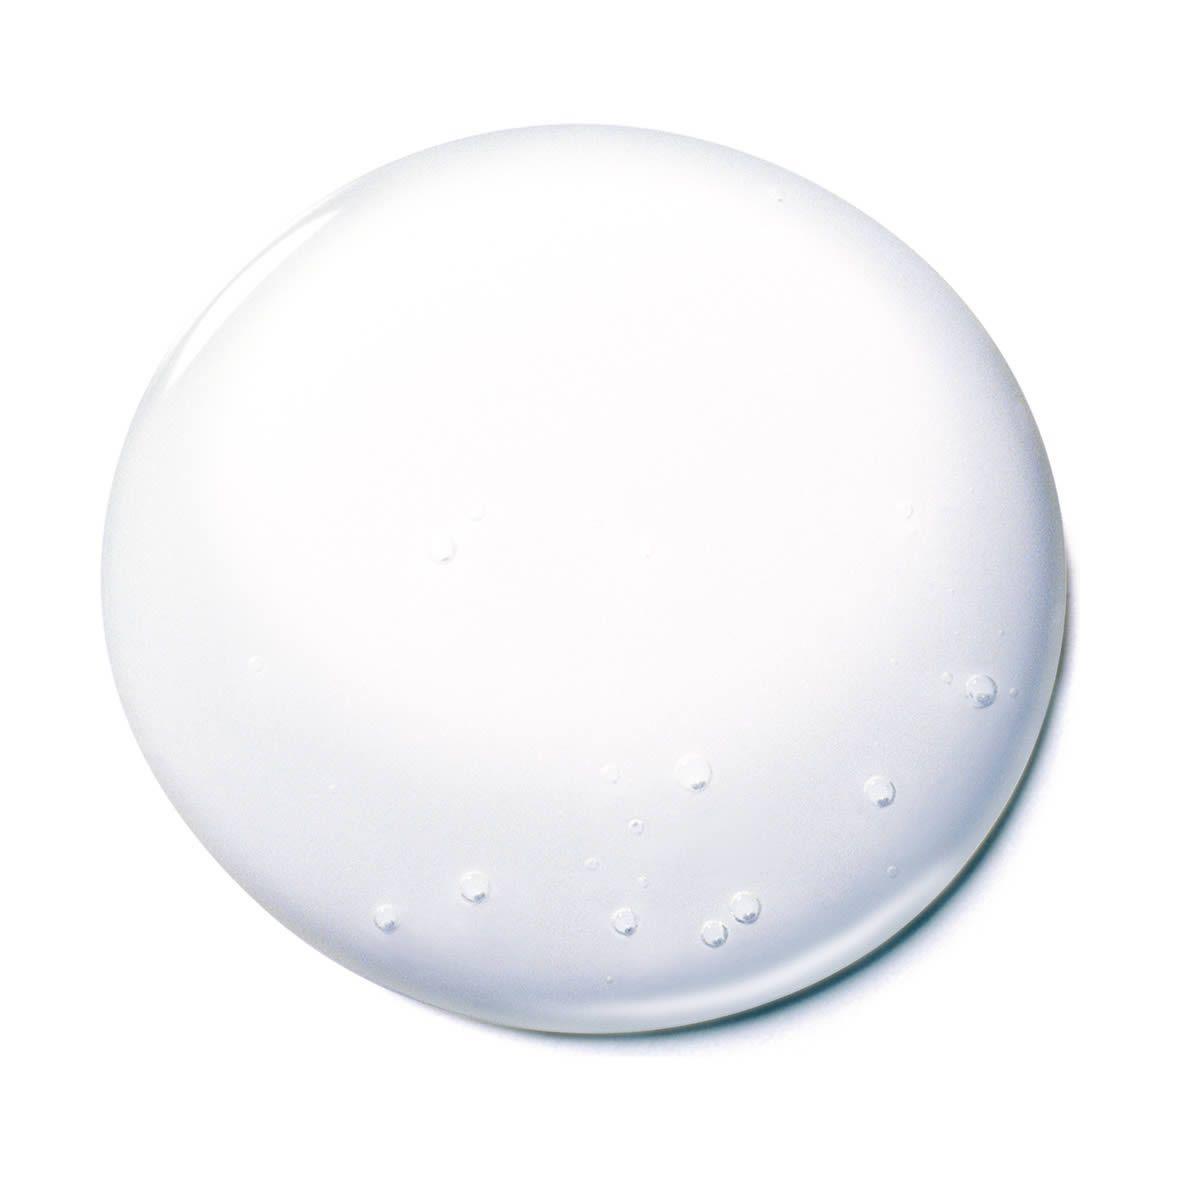 die besten 25 schuppen shampoo ideen auf pinterest schuppen kopfhaut hausmittel gegen. Black Bedroom Furniture Sets. Home Design Ideas